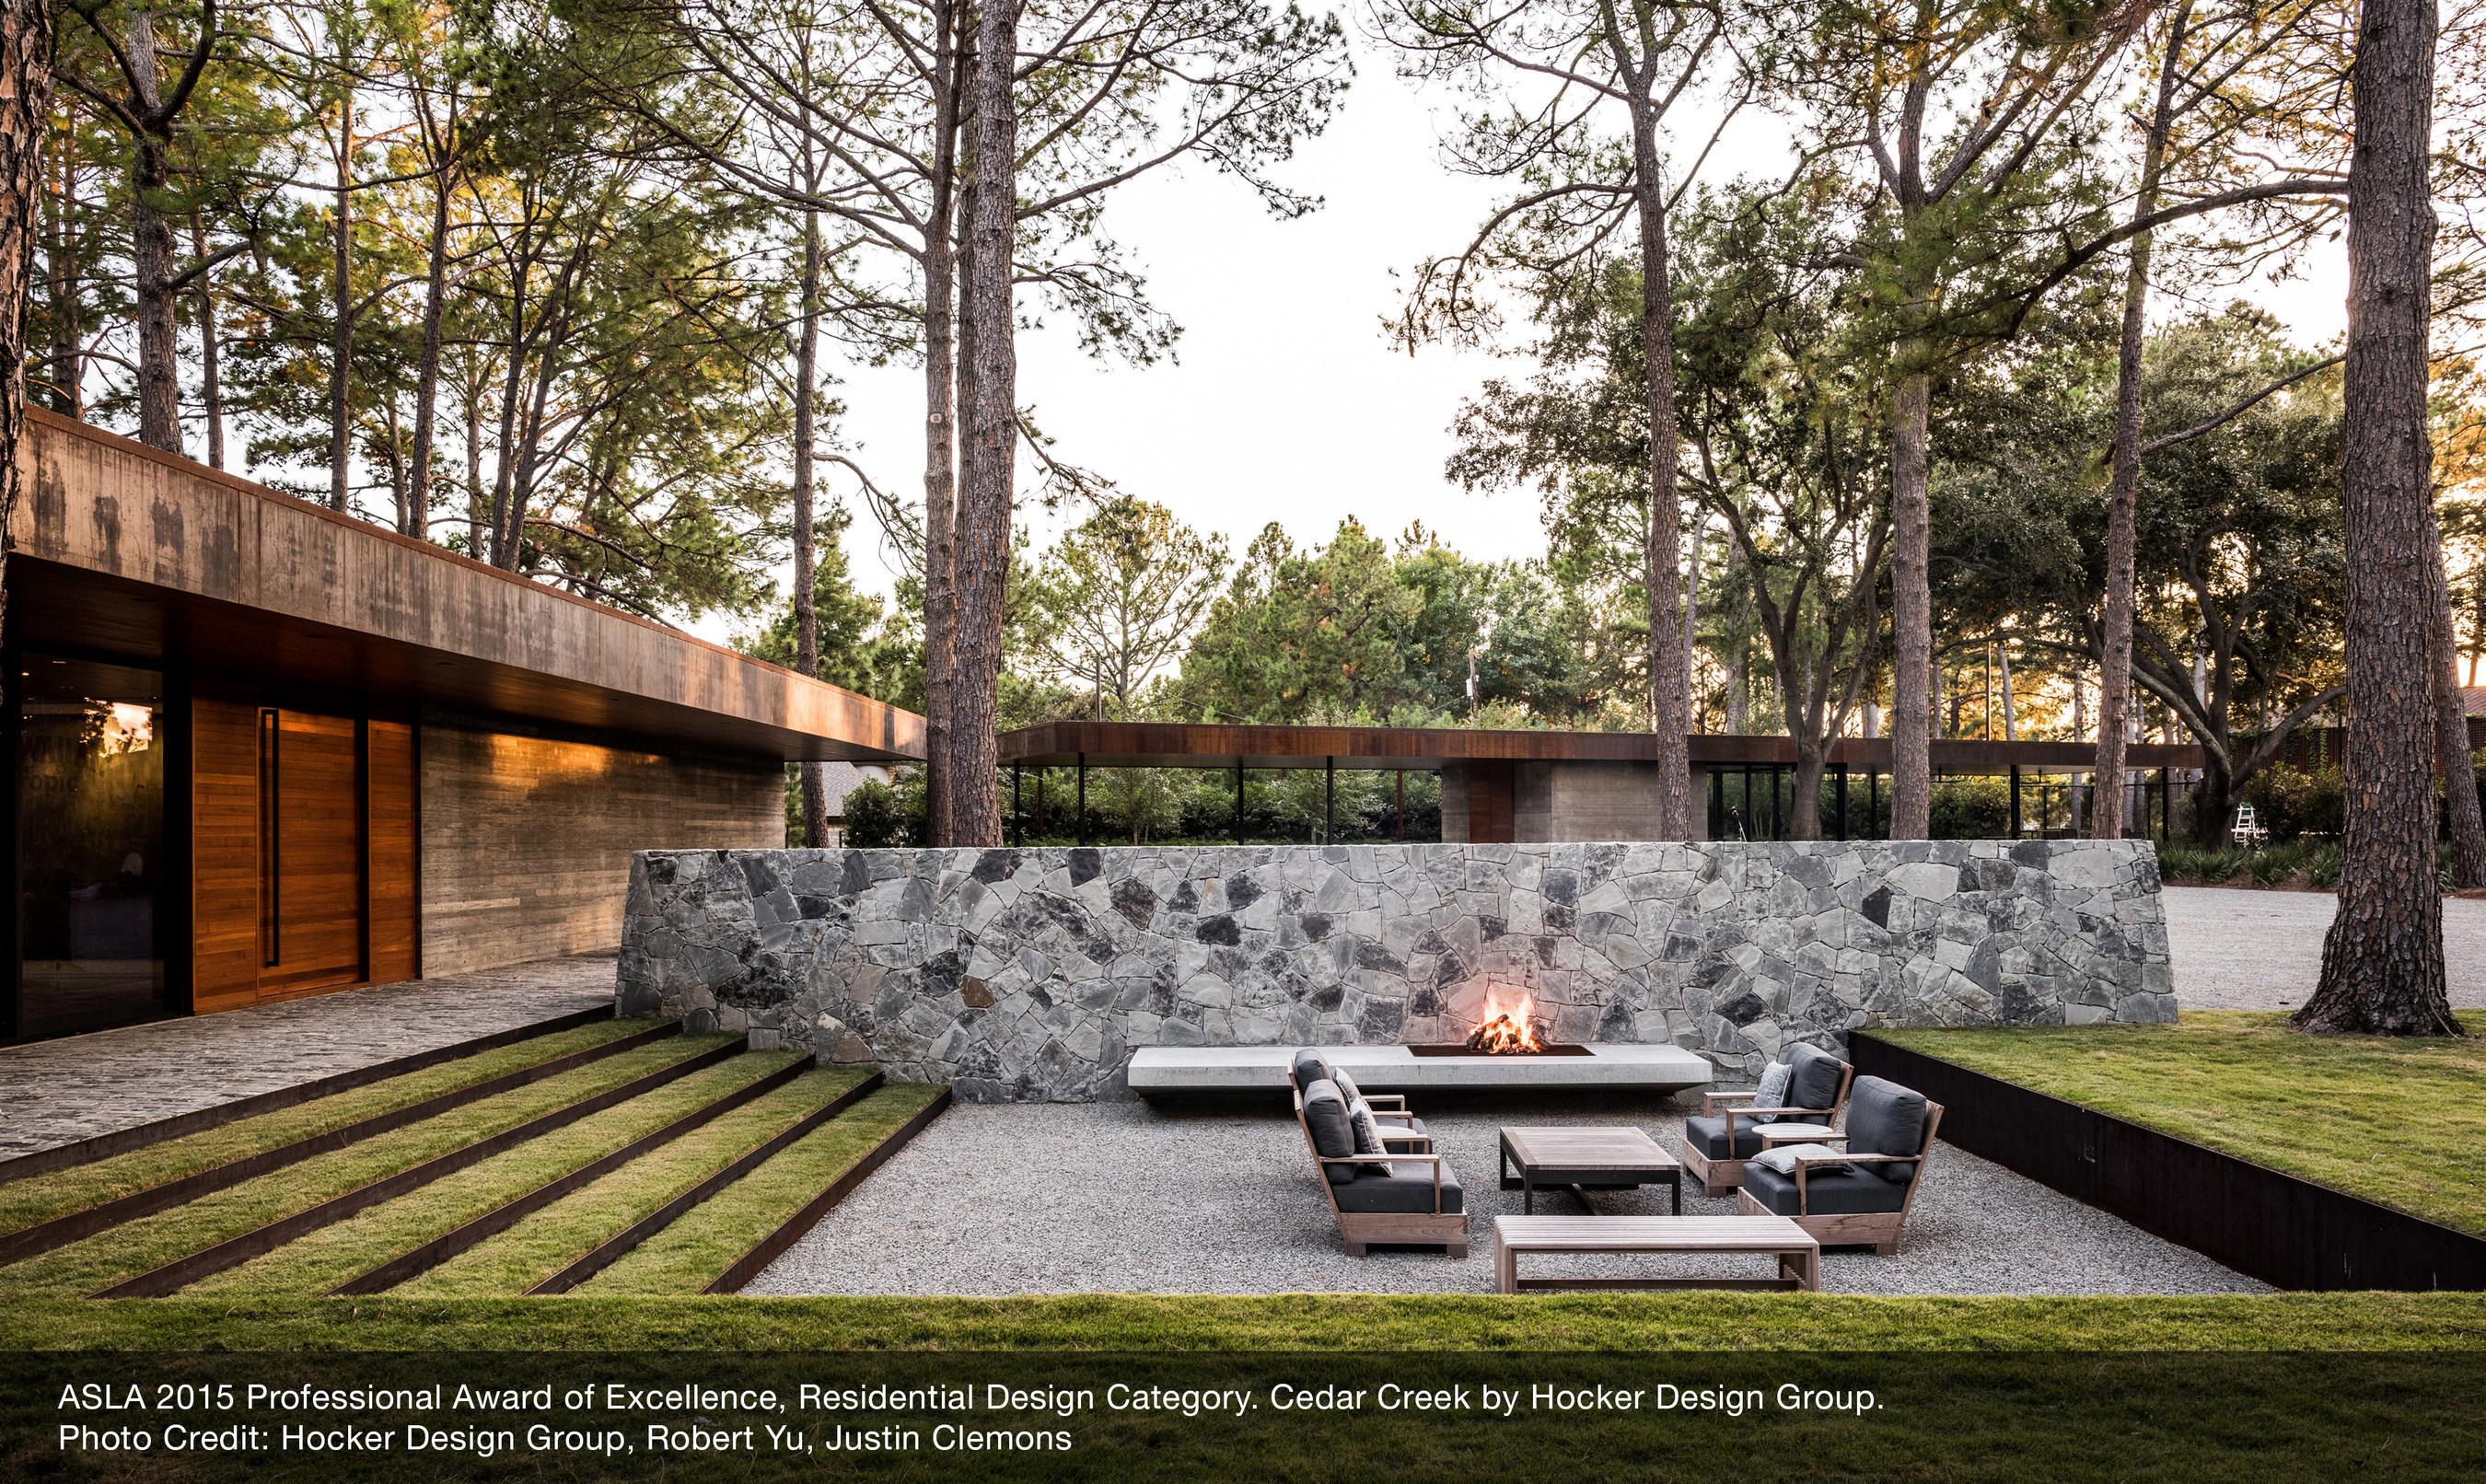 ASLA 2015 Professional Award of Excellence, Residential Design Category. Cedar Creek by Hocker Design Group. Photo Credit: Hocker Design Group, Robert Yu, Justin Clemons